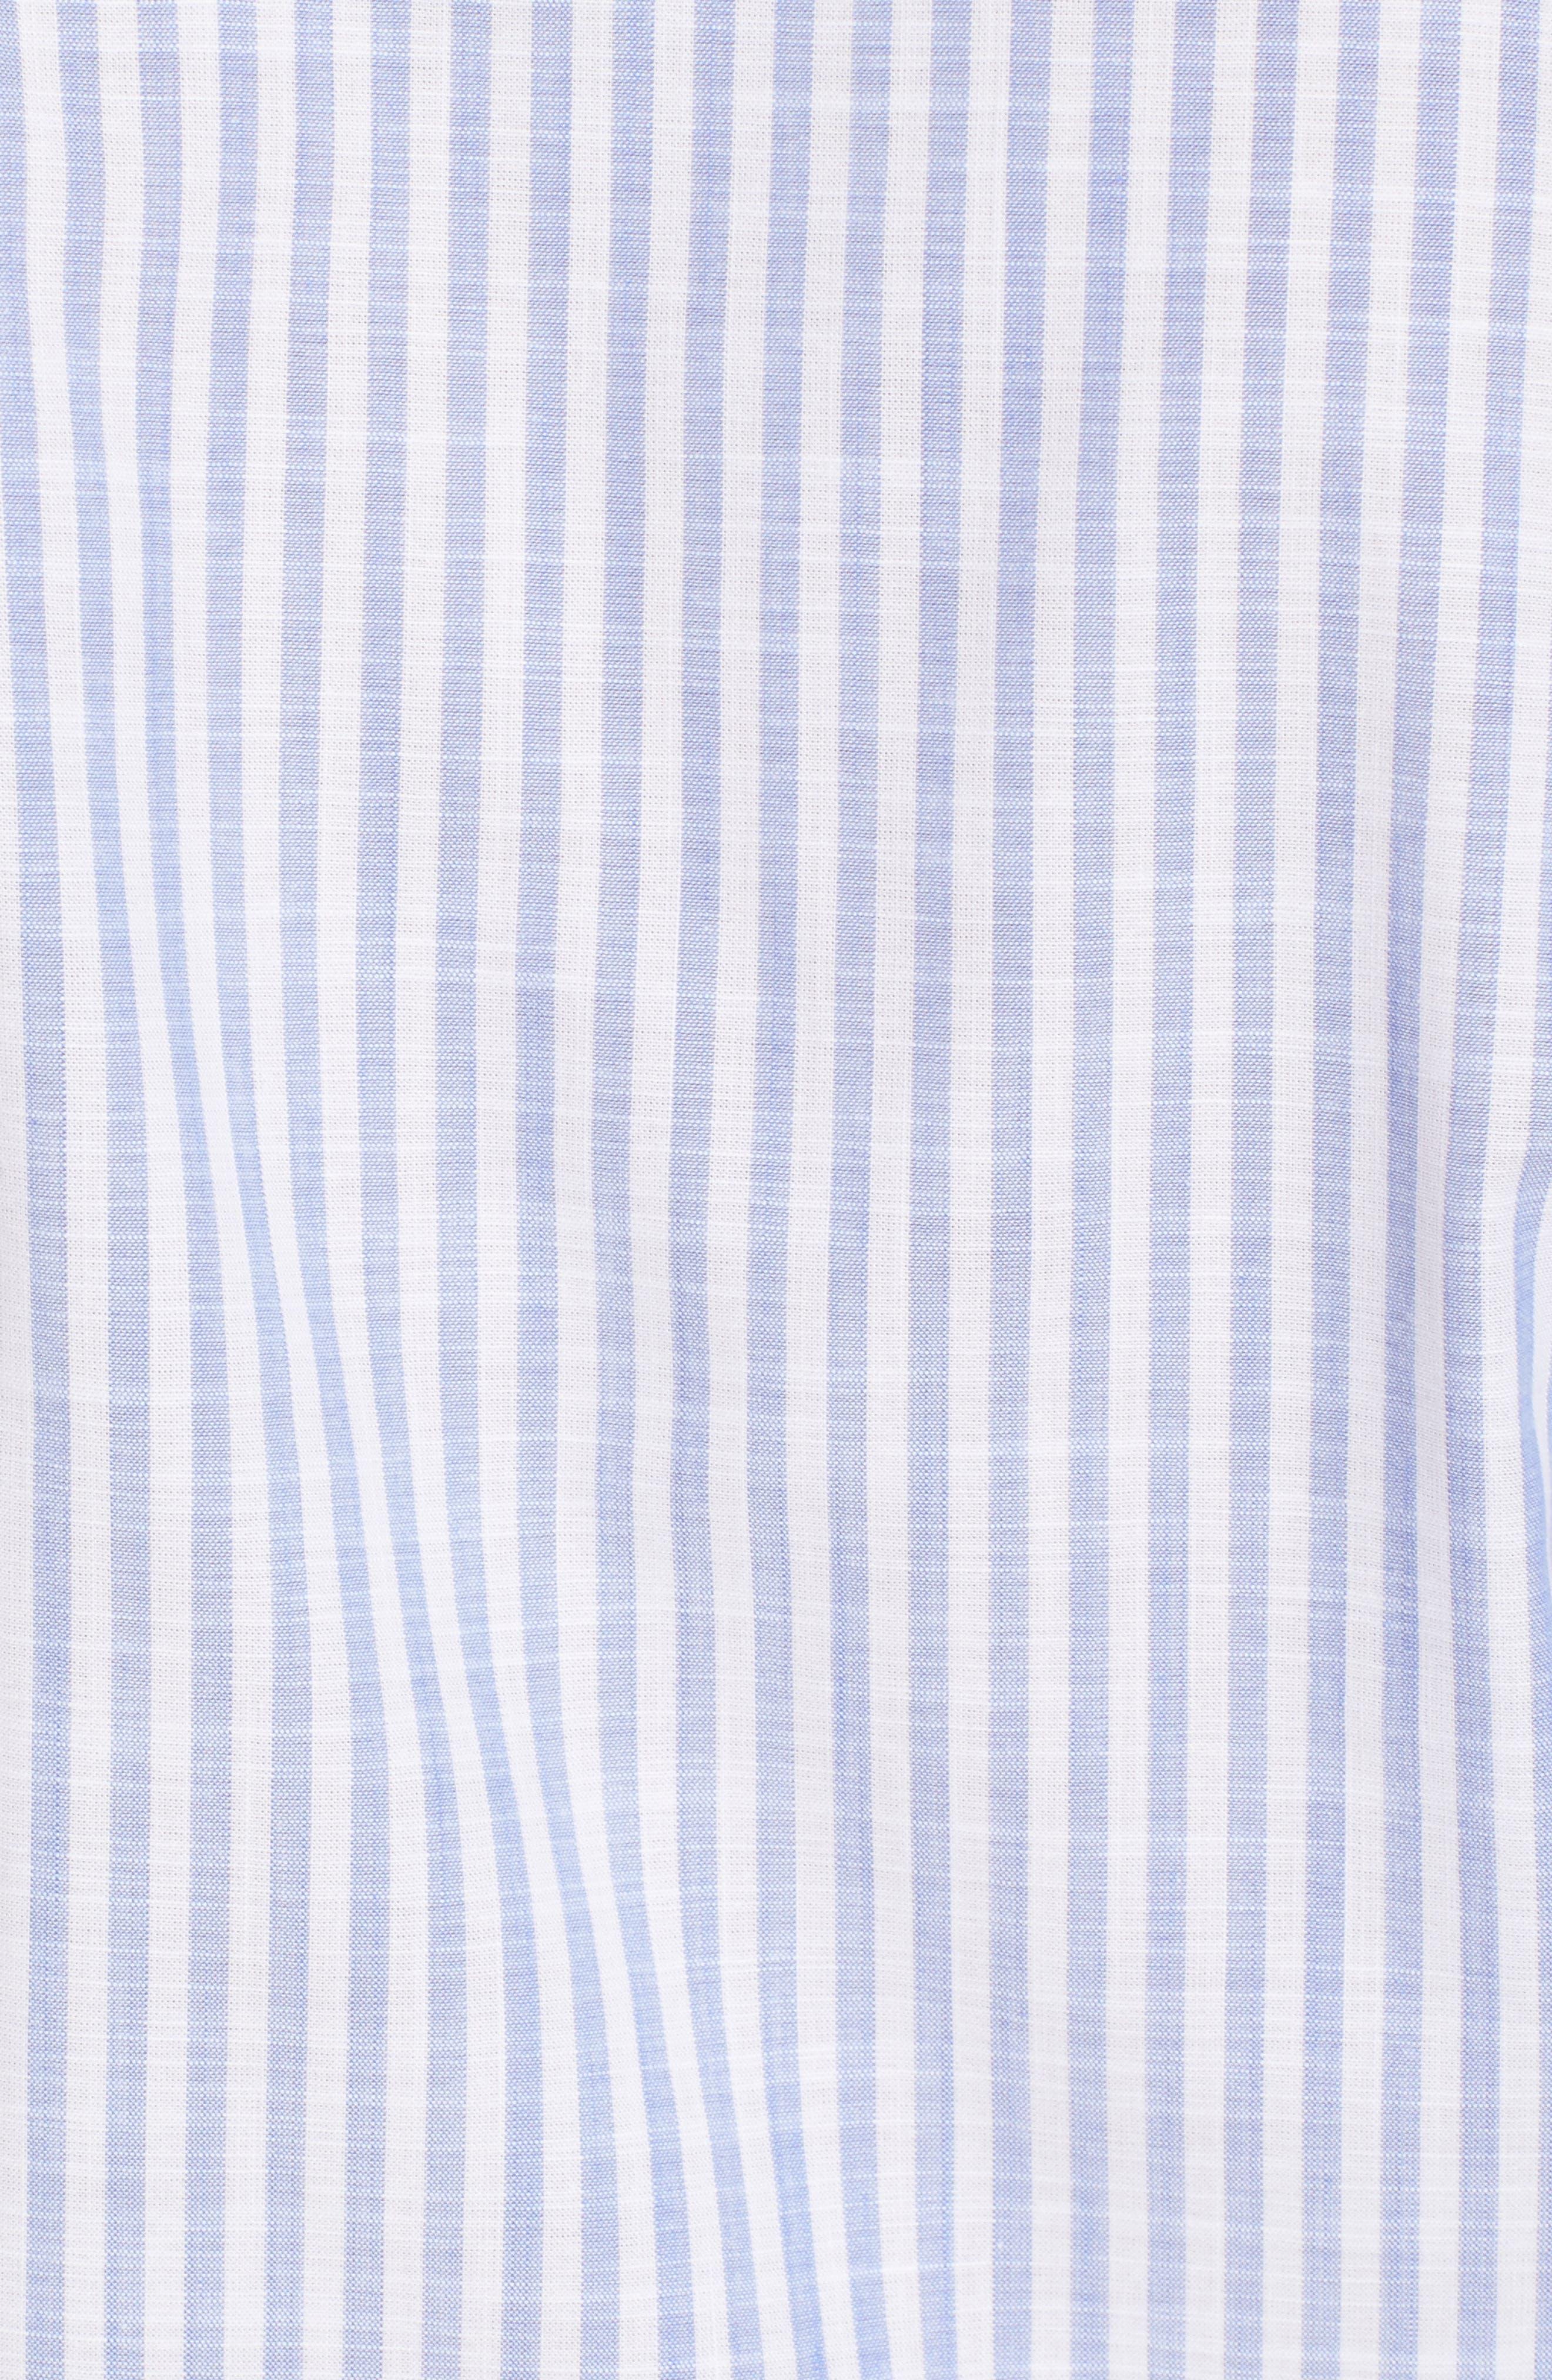 Summer Stripe Chambray Sport Shirt,                             Alternate thumbnail 5, color,                             Blue Ceillo